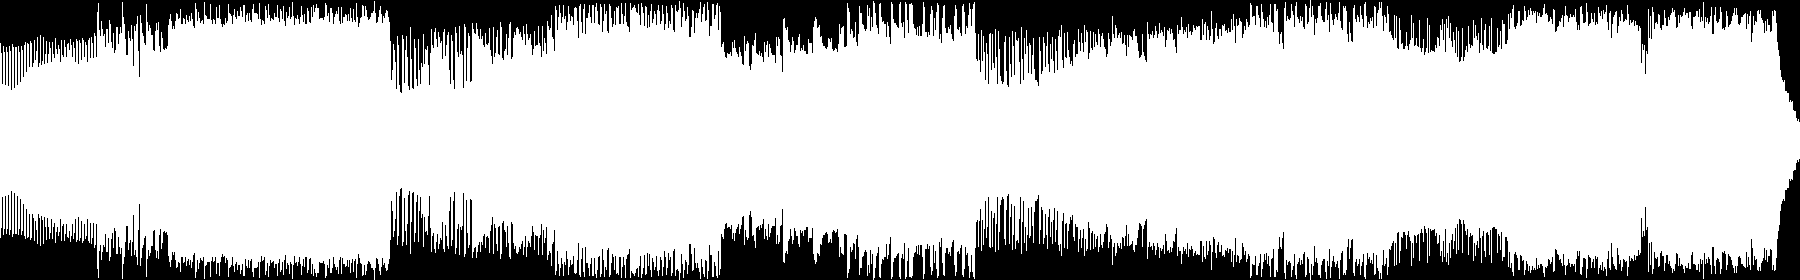 O.D.Z.A audio waveform